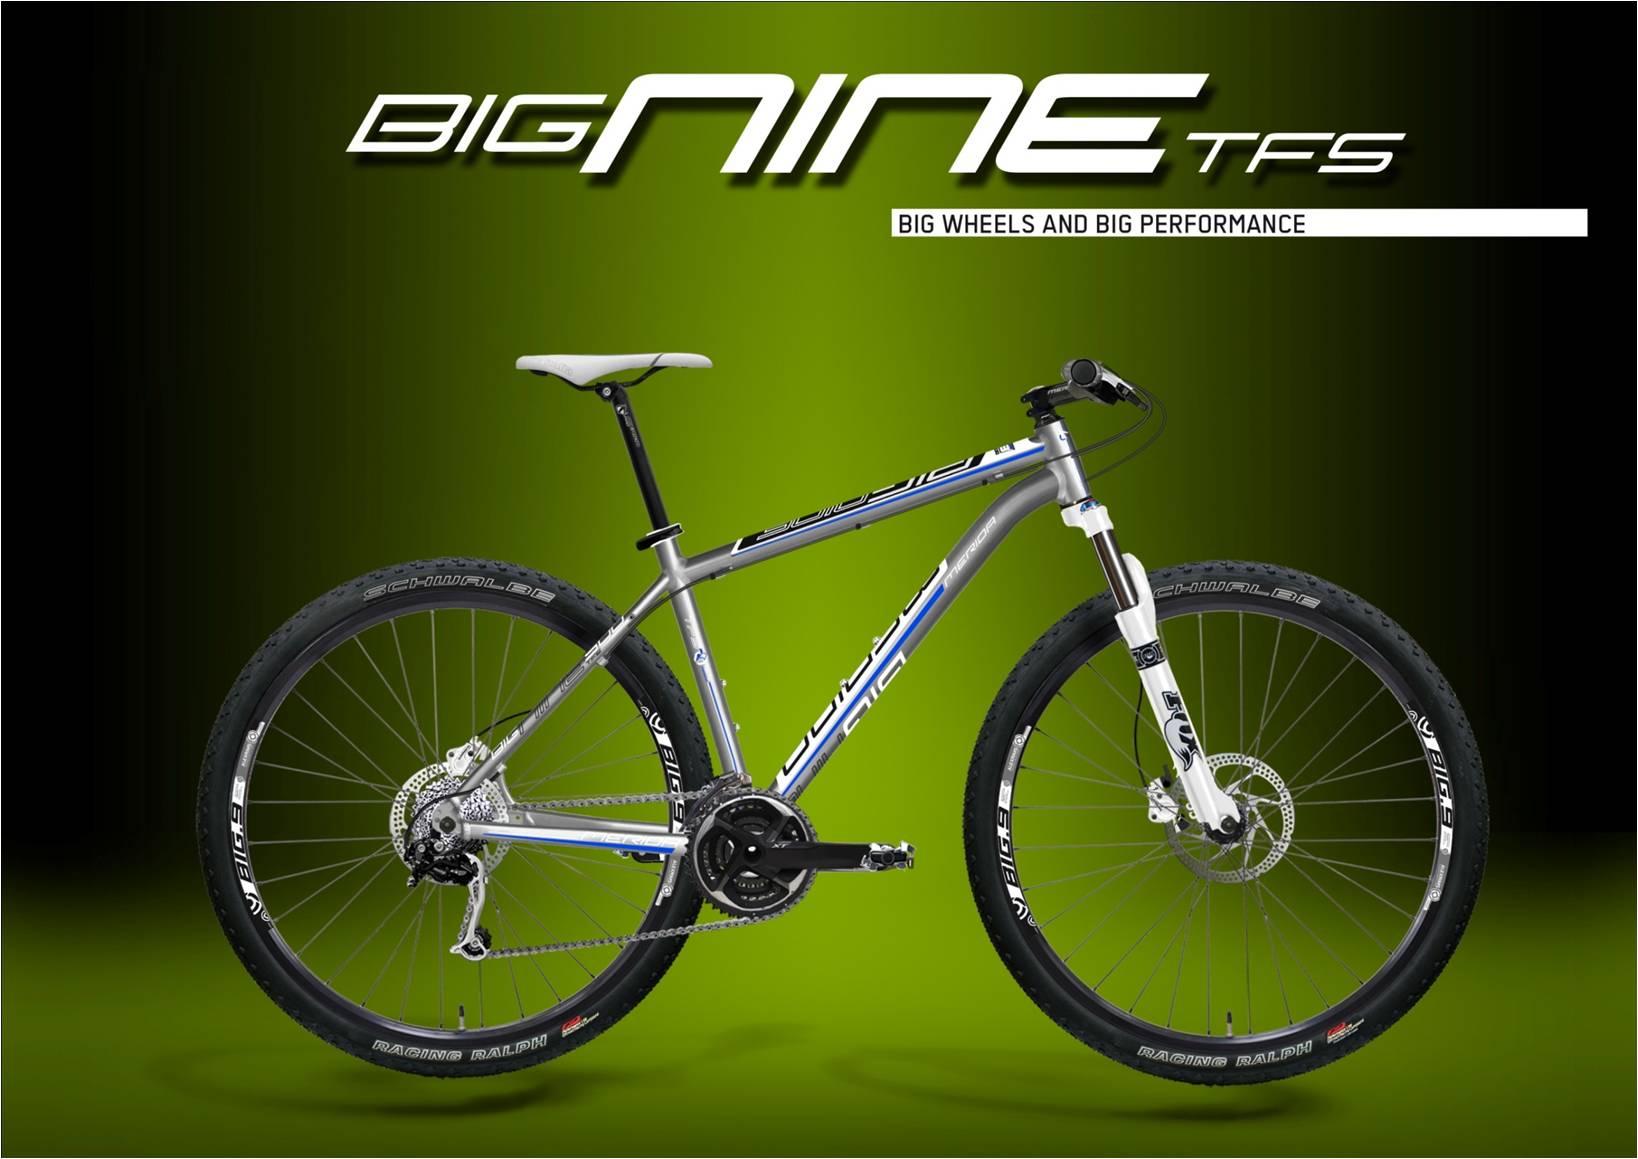 81931-Bignine-TFS.jpg